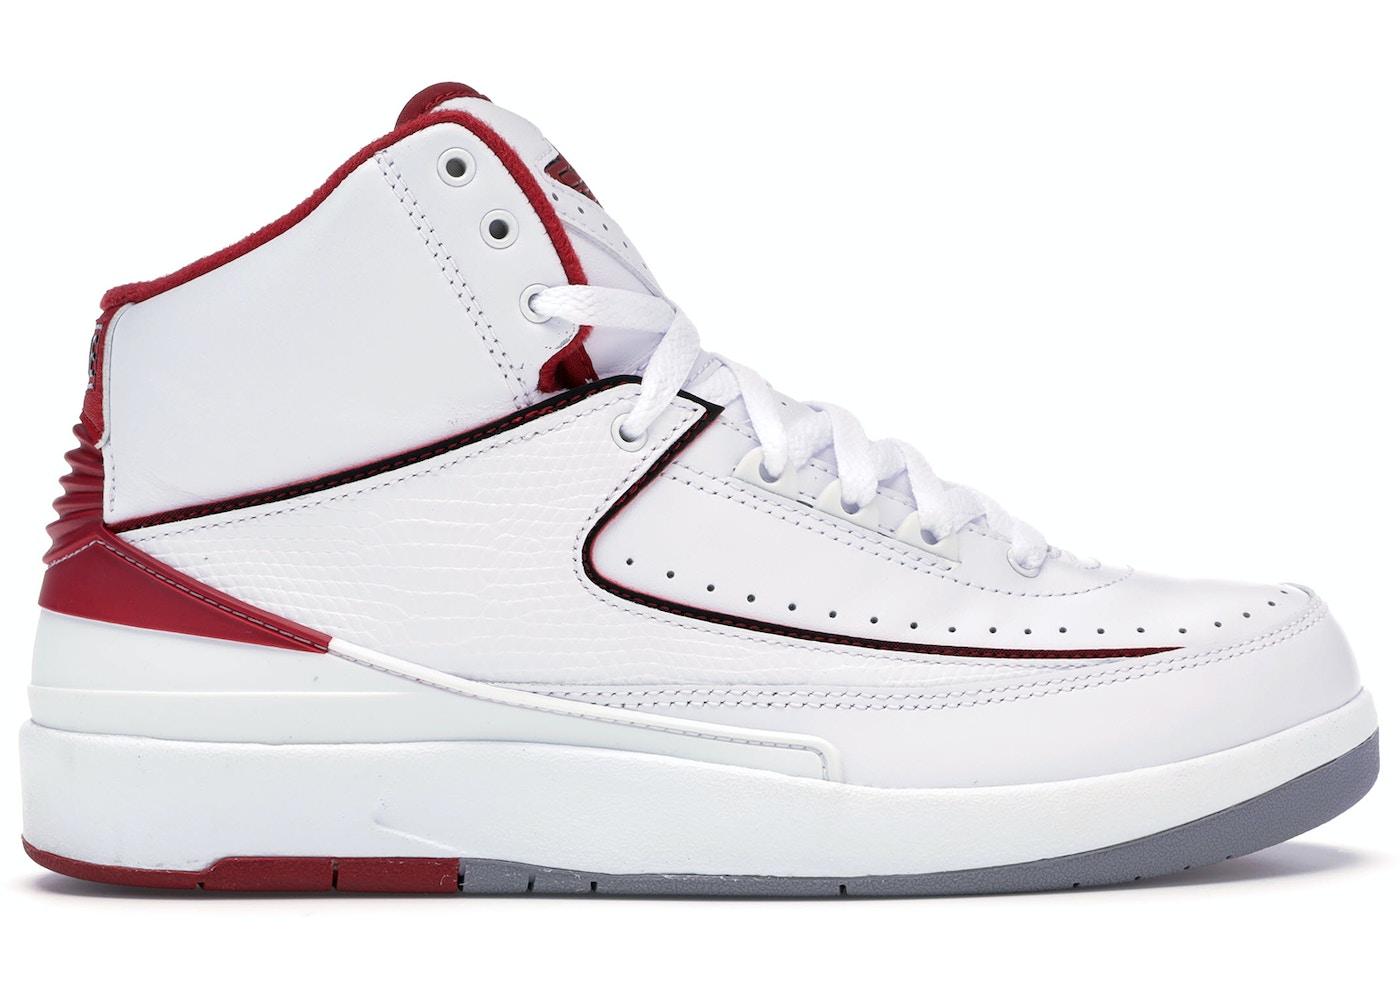 21a60a1686e7 Buy Air Jordan 2 Shoes   Deadstock Sneakers